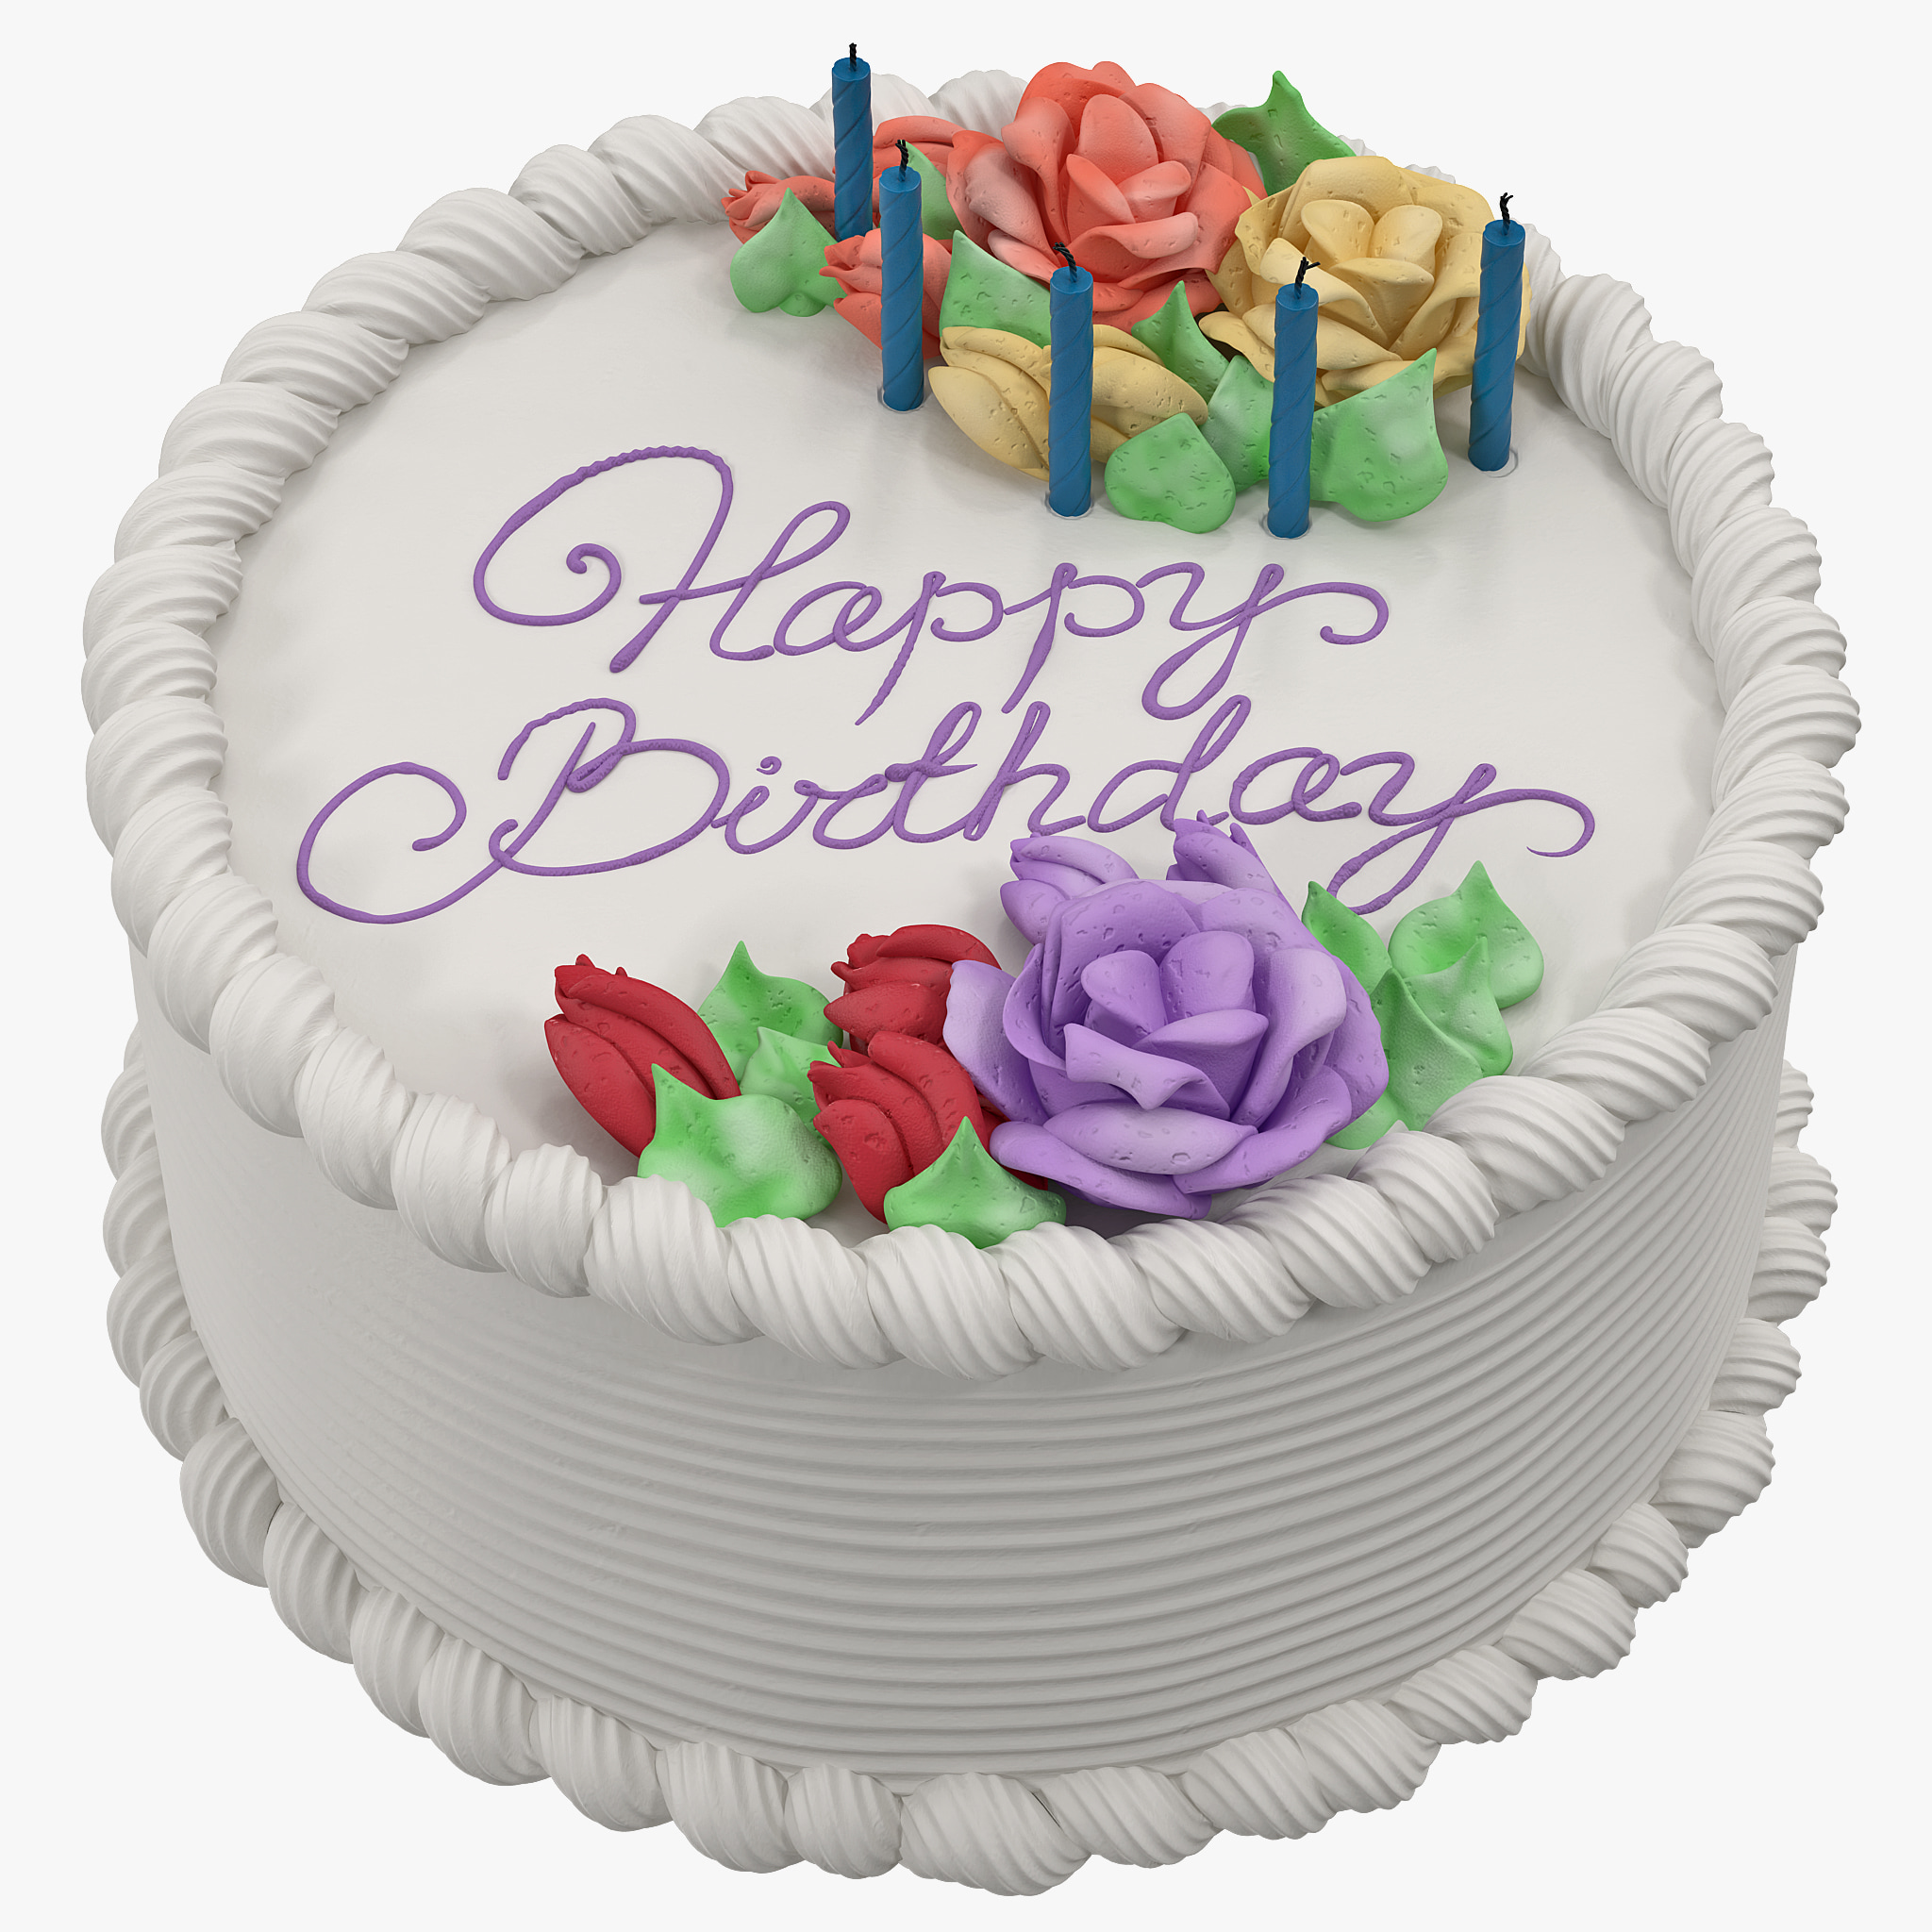 Birthday Cake_1.jpg